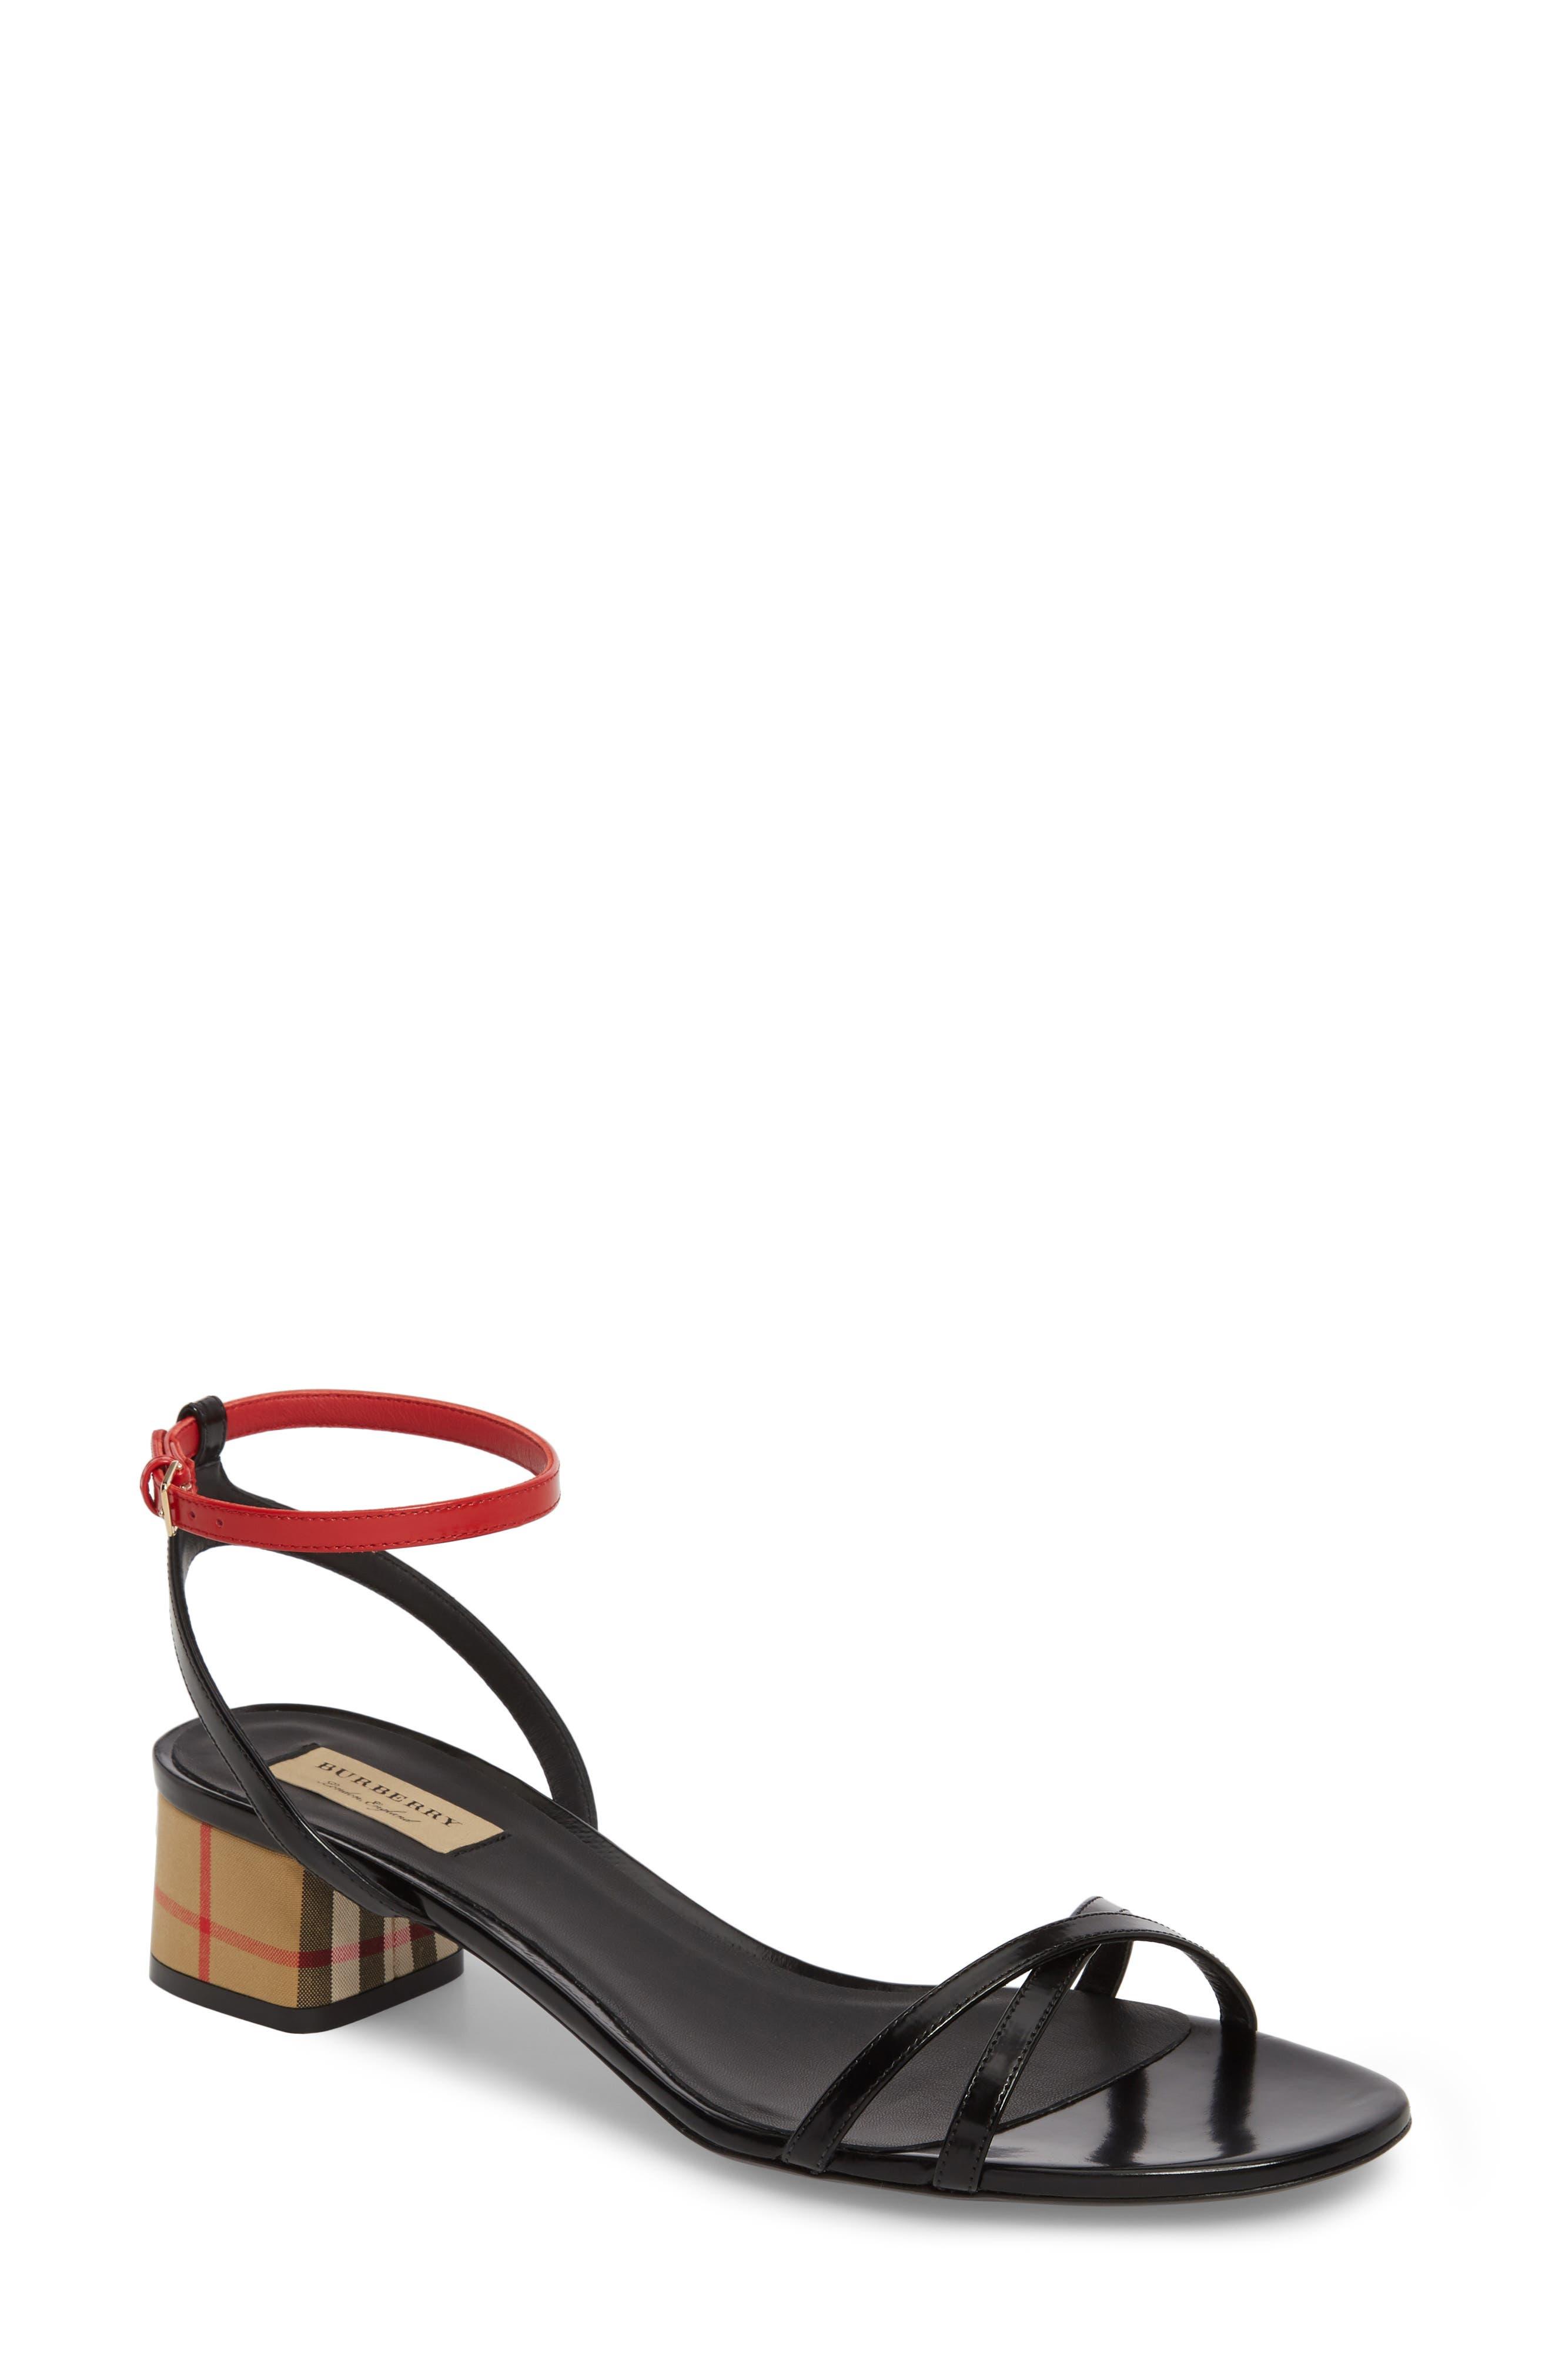 Burberry Anthea Check Ankle Strap Sandal (Women)